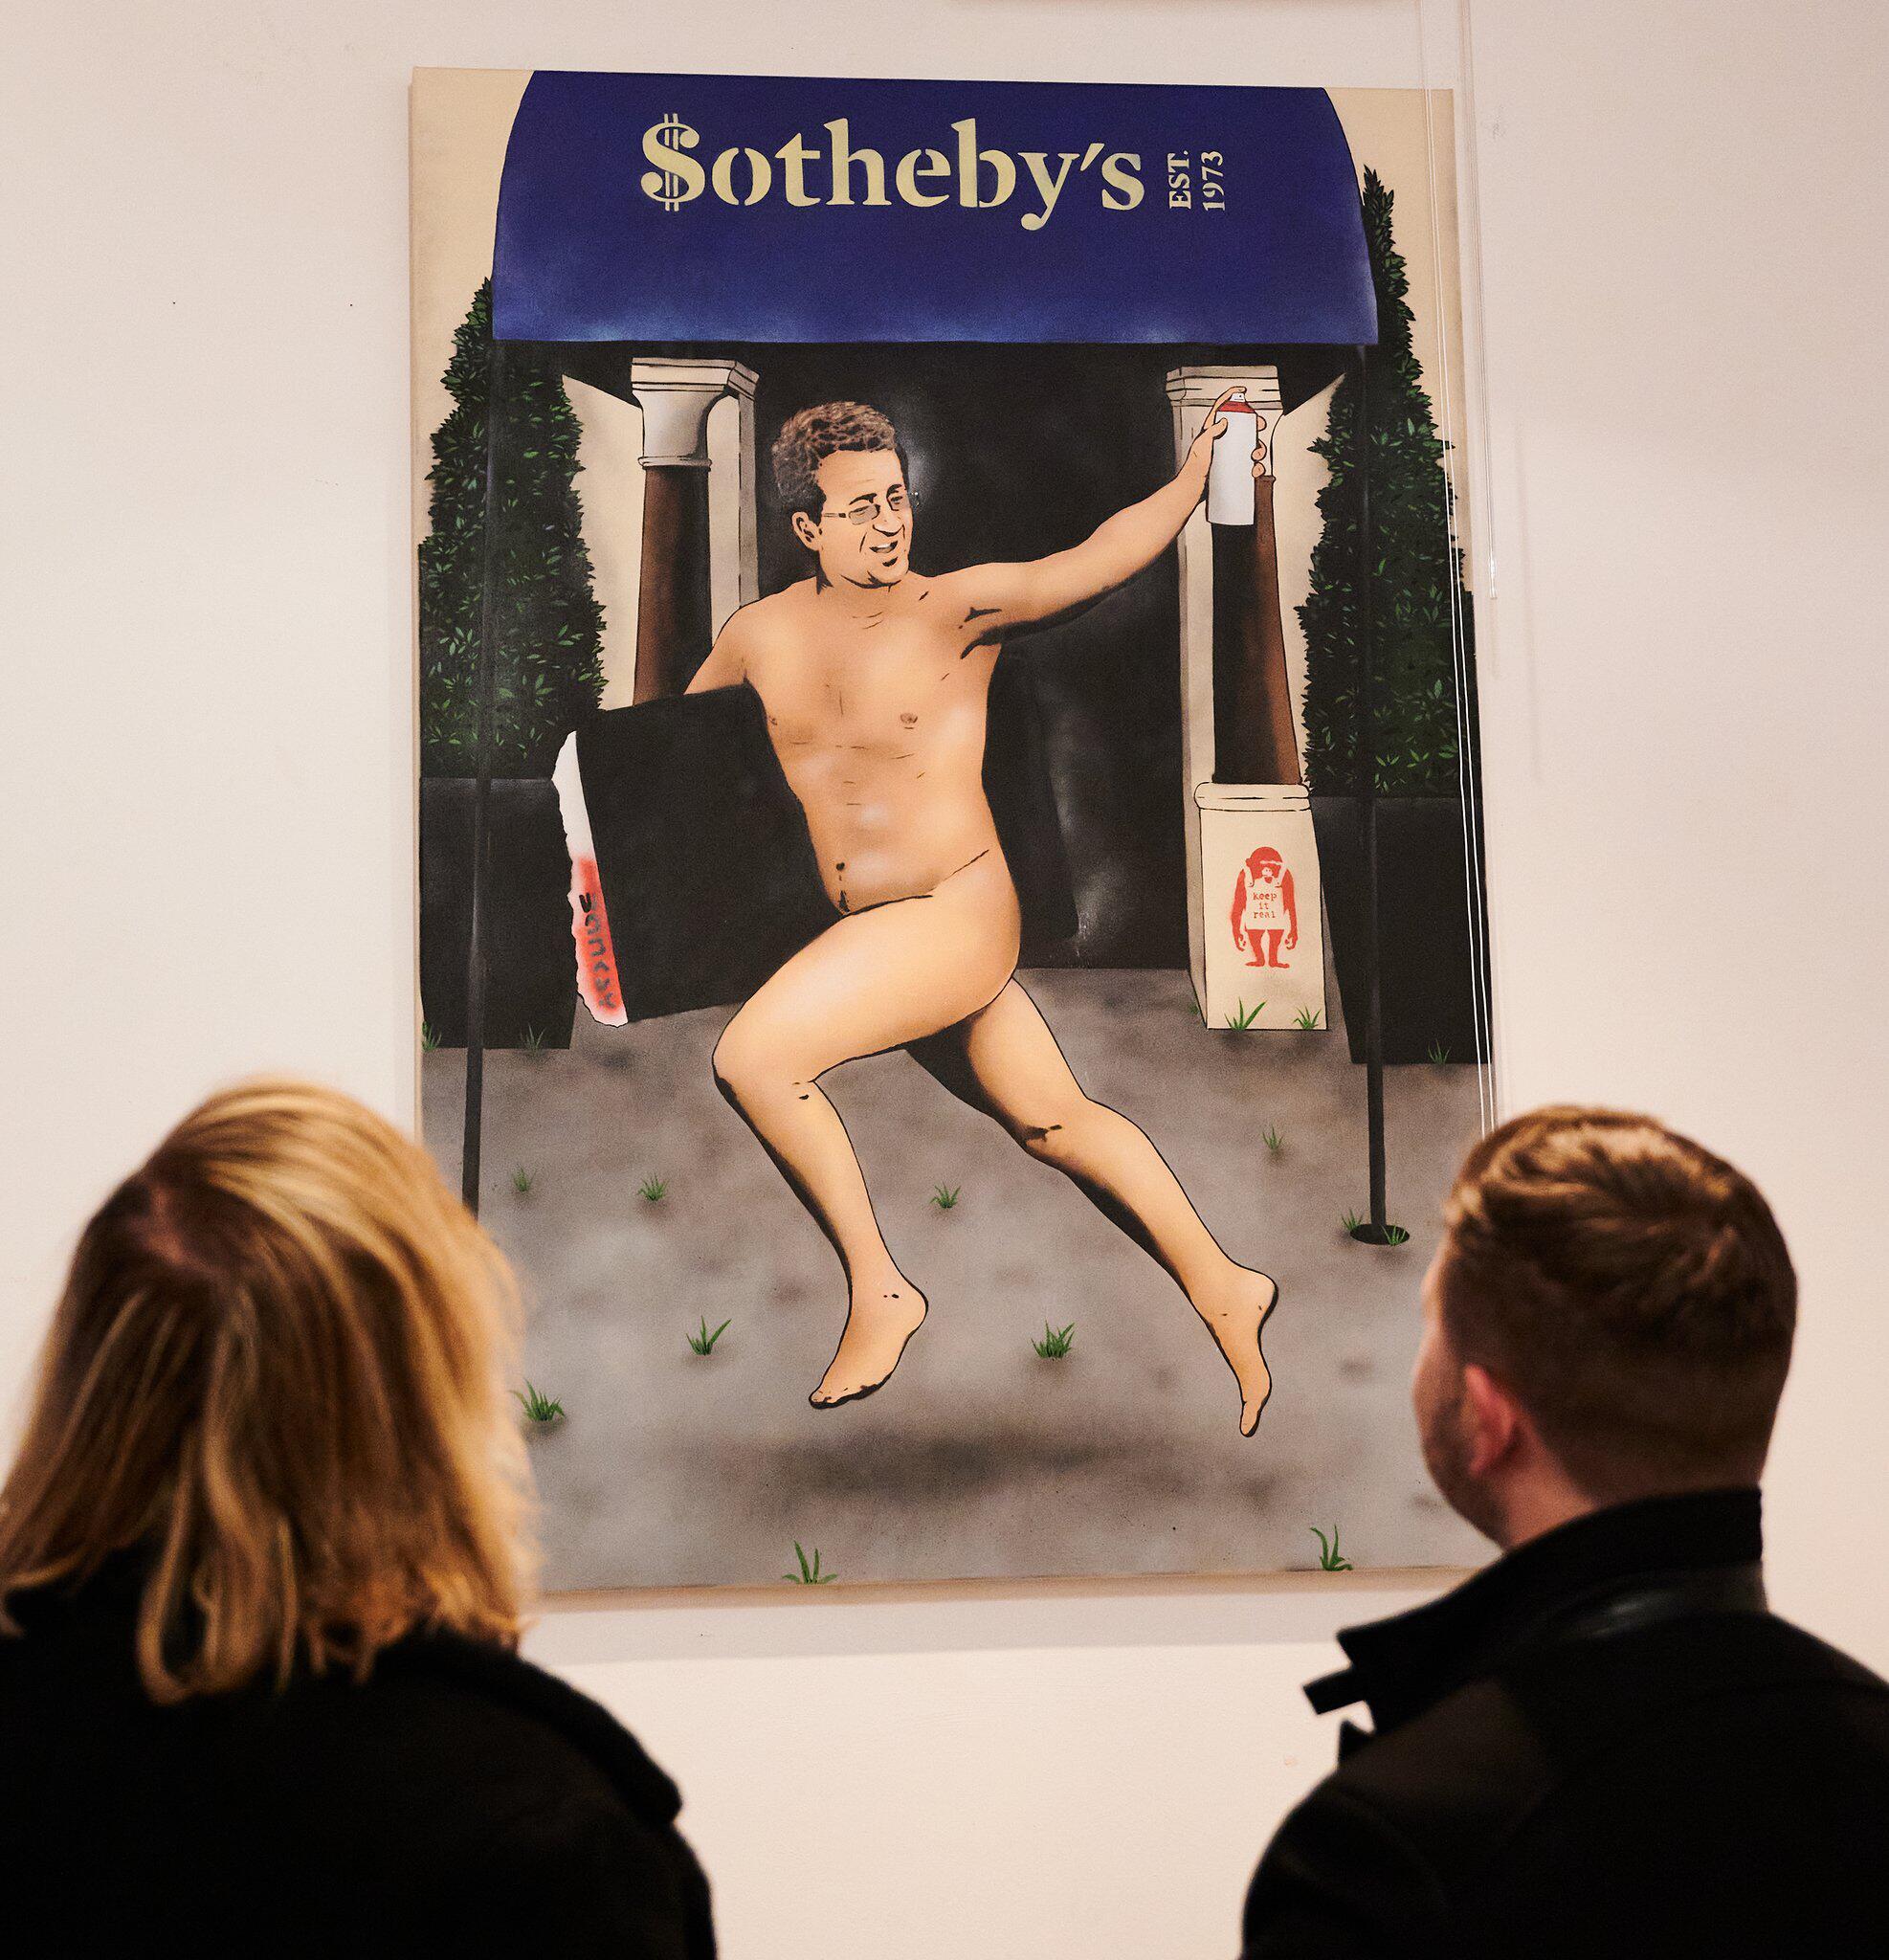 Bild zu Banksy, Gesicht, Galerie, Enthüllung, Berlin, JPS, Jamie Paul Scanlon, Kultur Späti